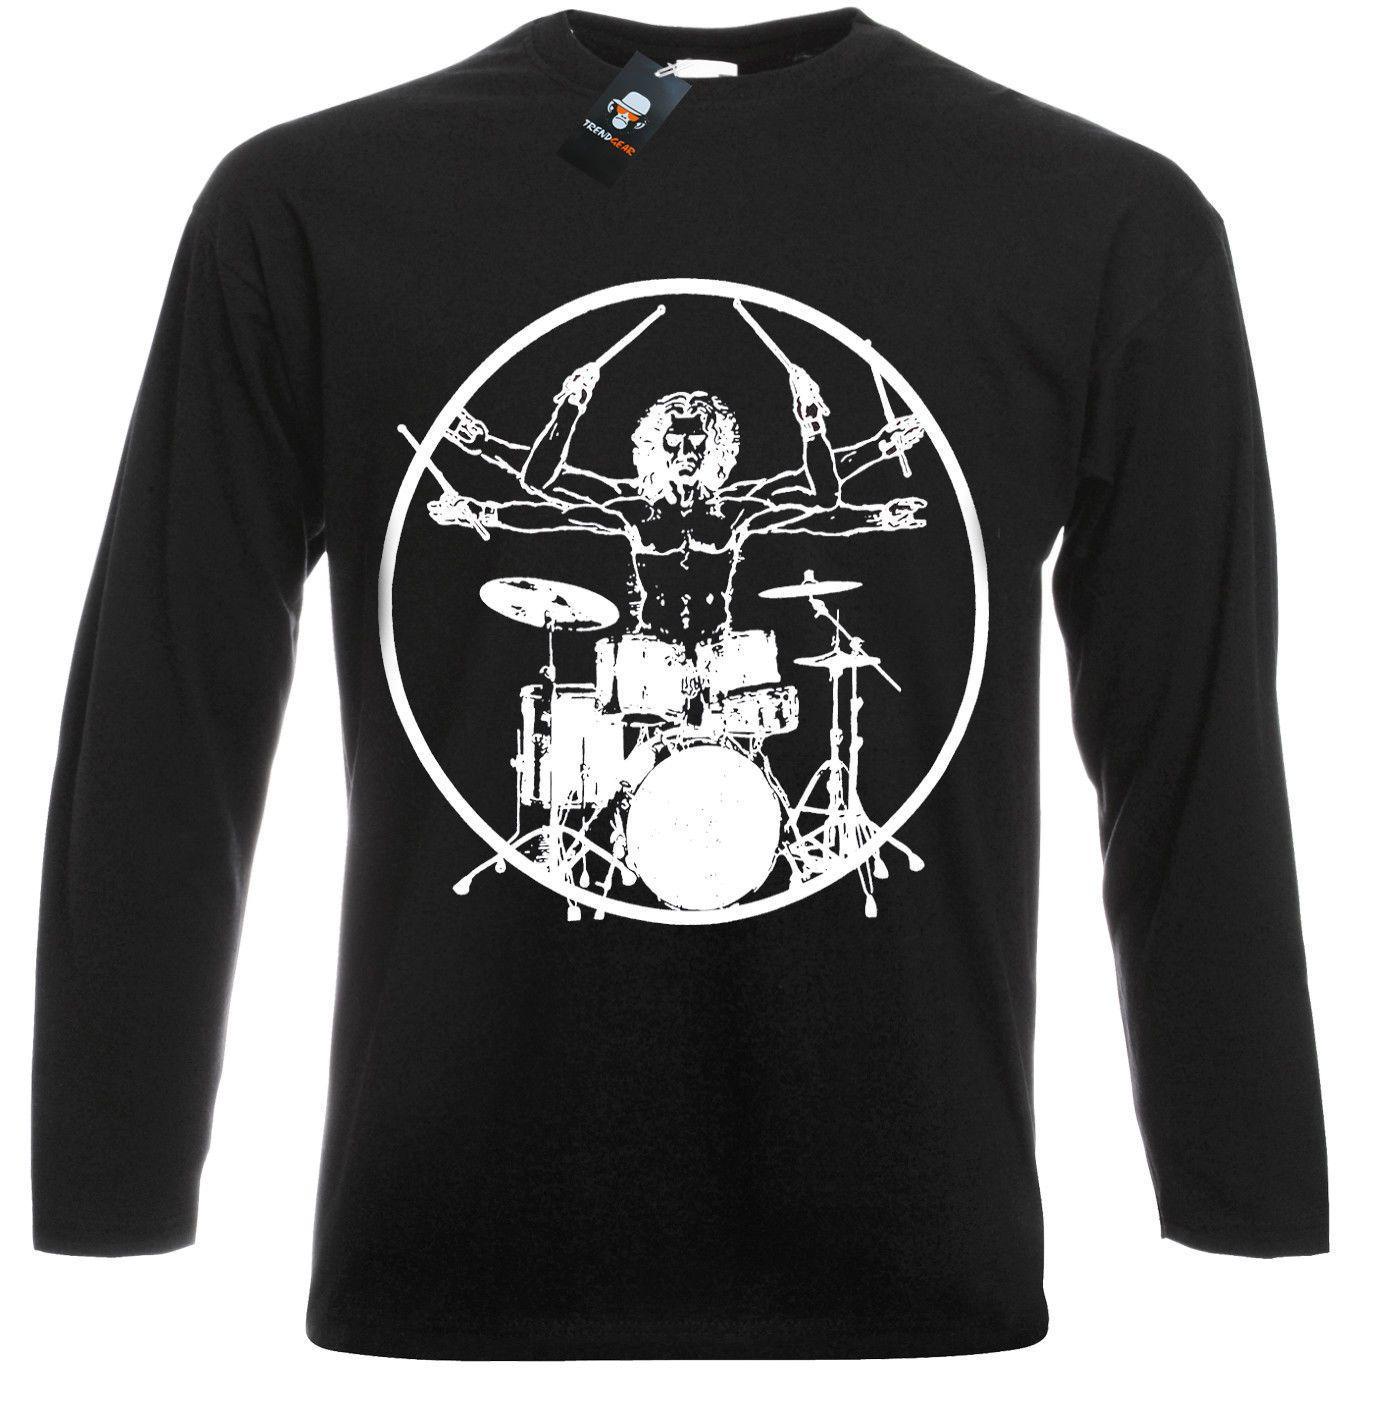 Vitruvian Drummer//Funny//Drumming//T Shirt//Drums//Drum//Kit Stick//Music//Rock//Top//Tee